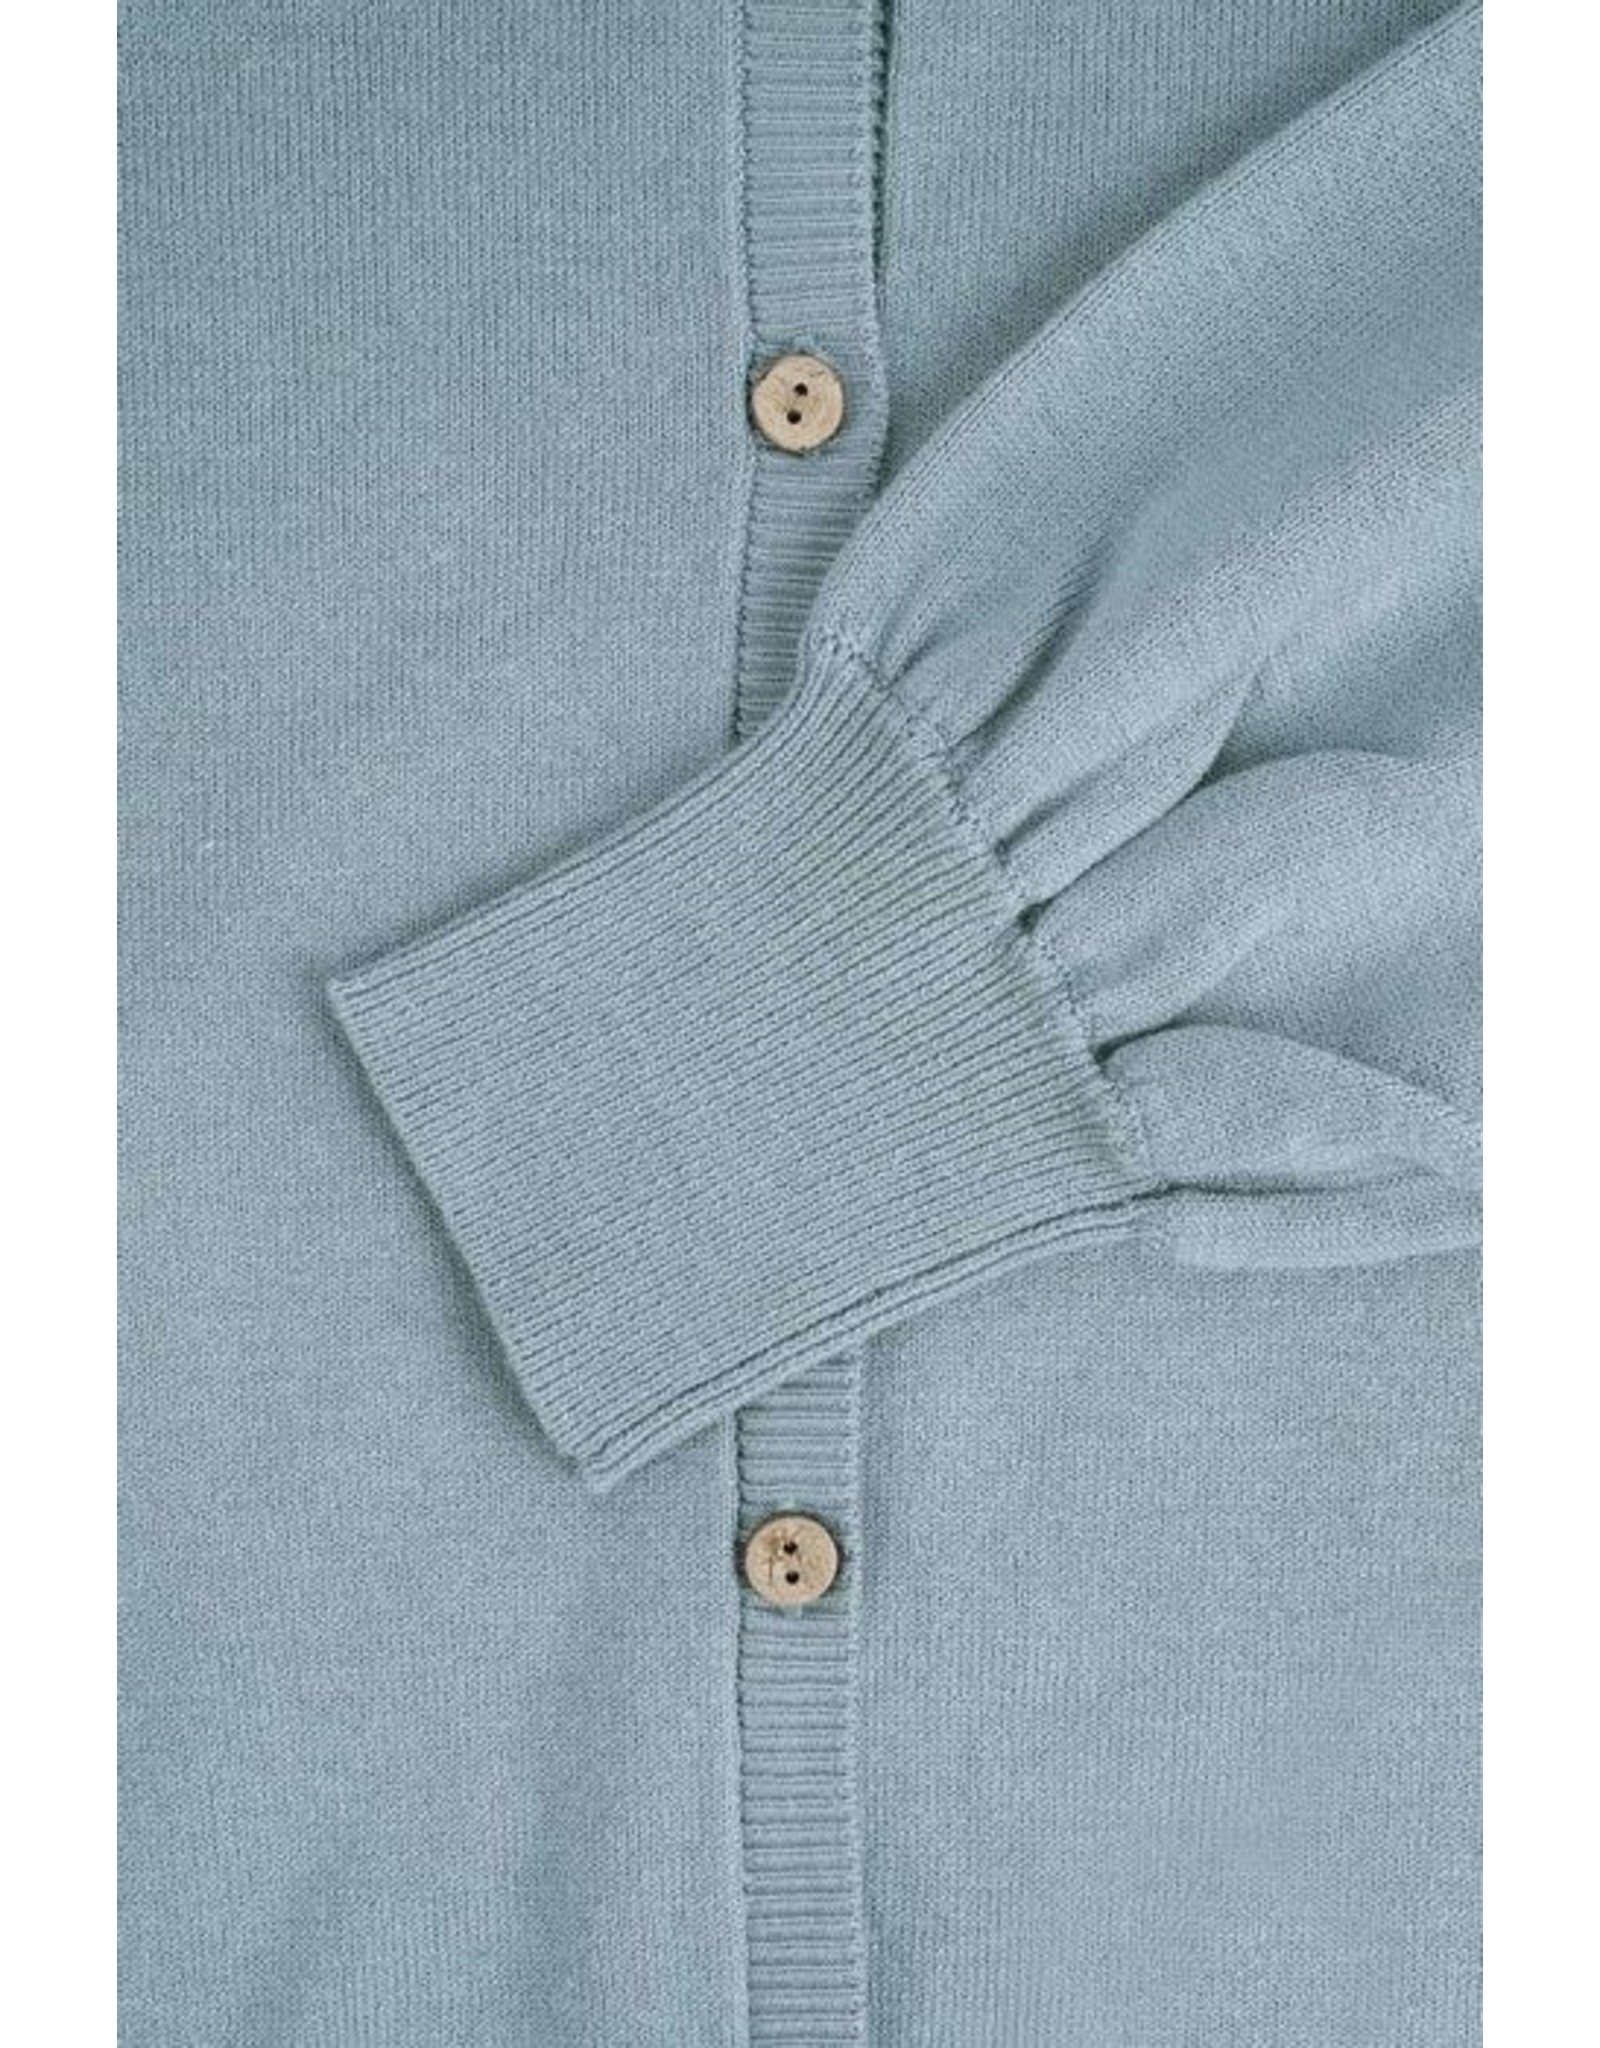 Zusss Zusss Basic vestje Grijs-Blauw